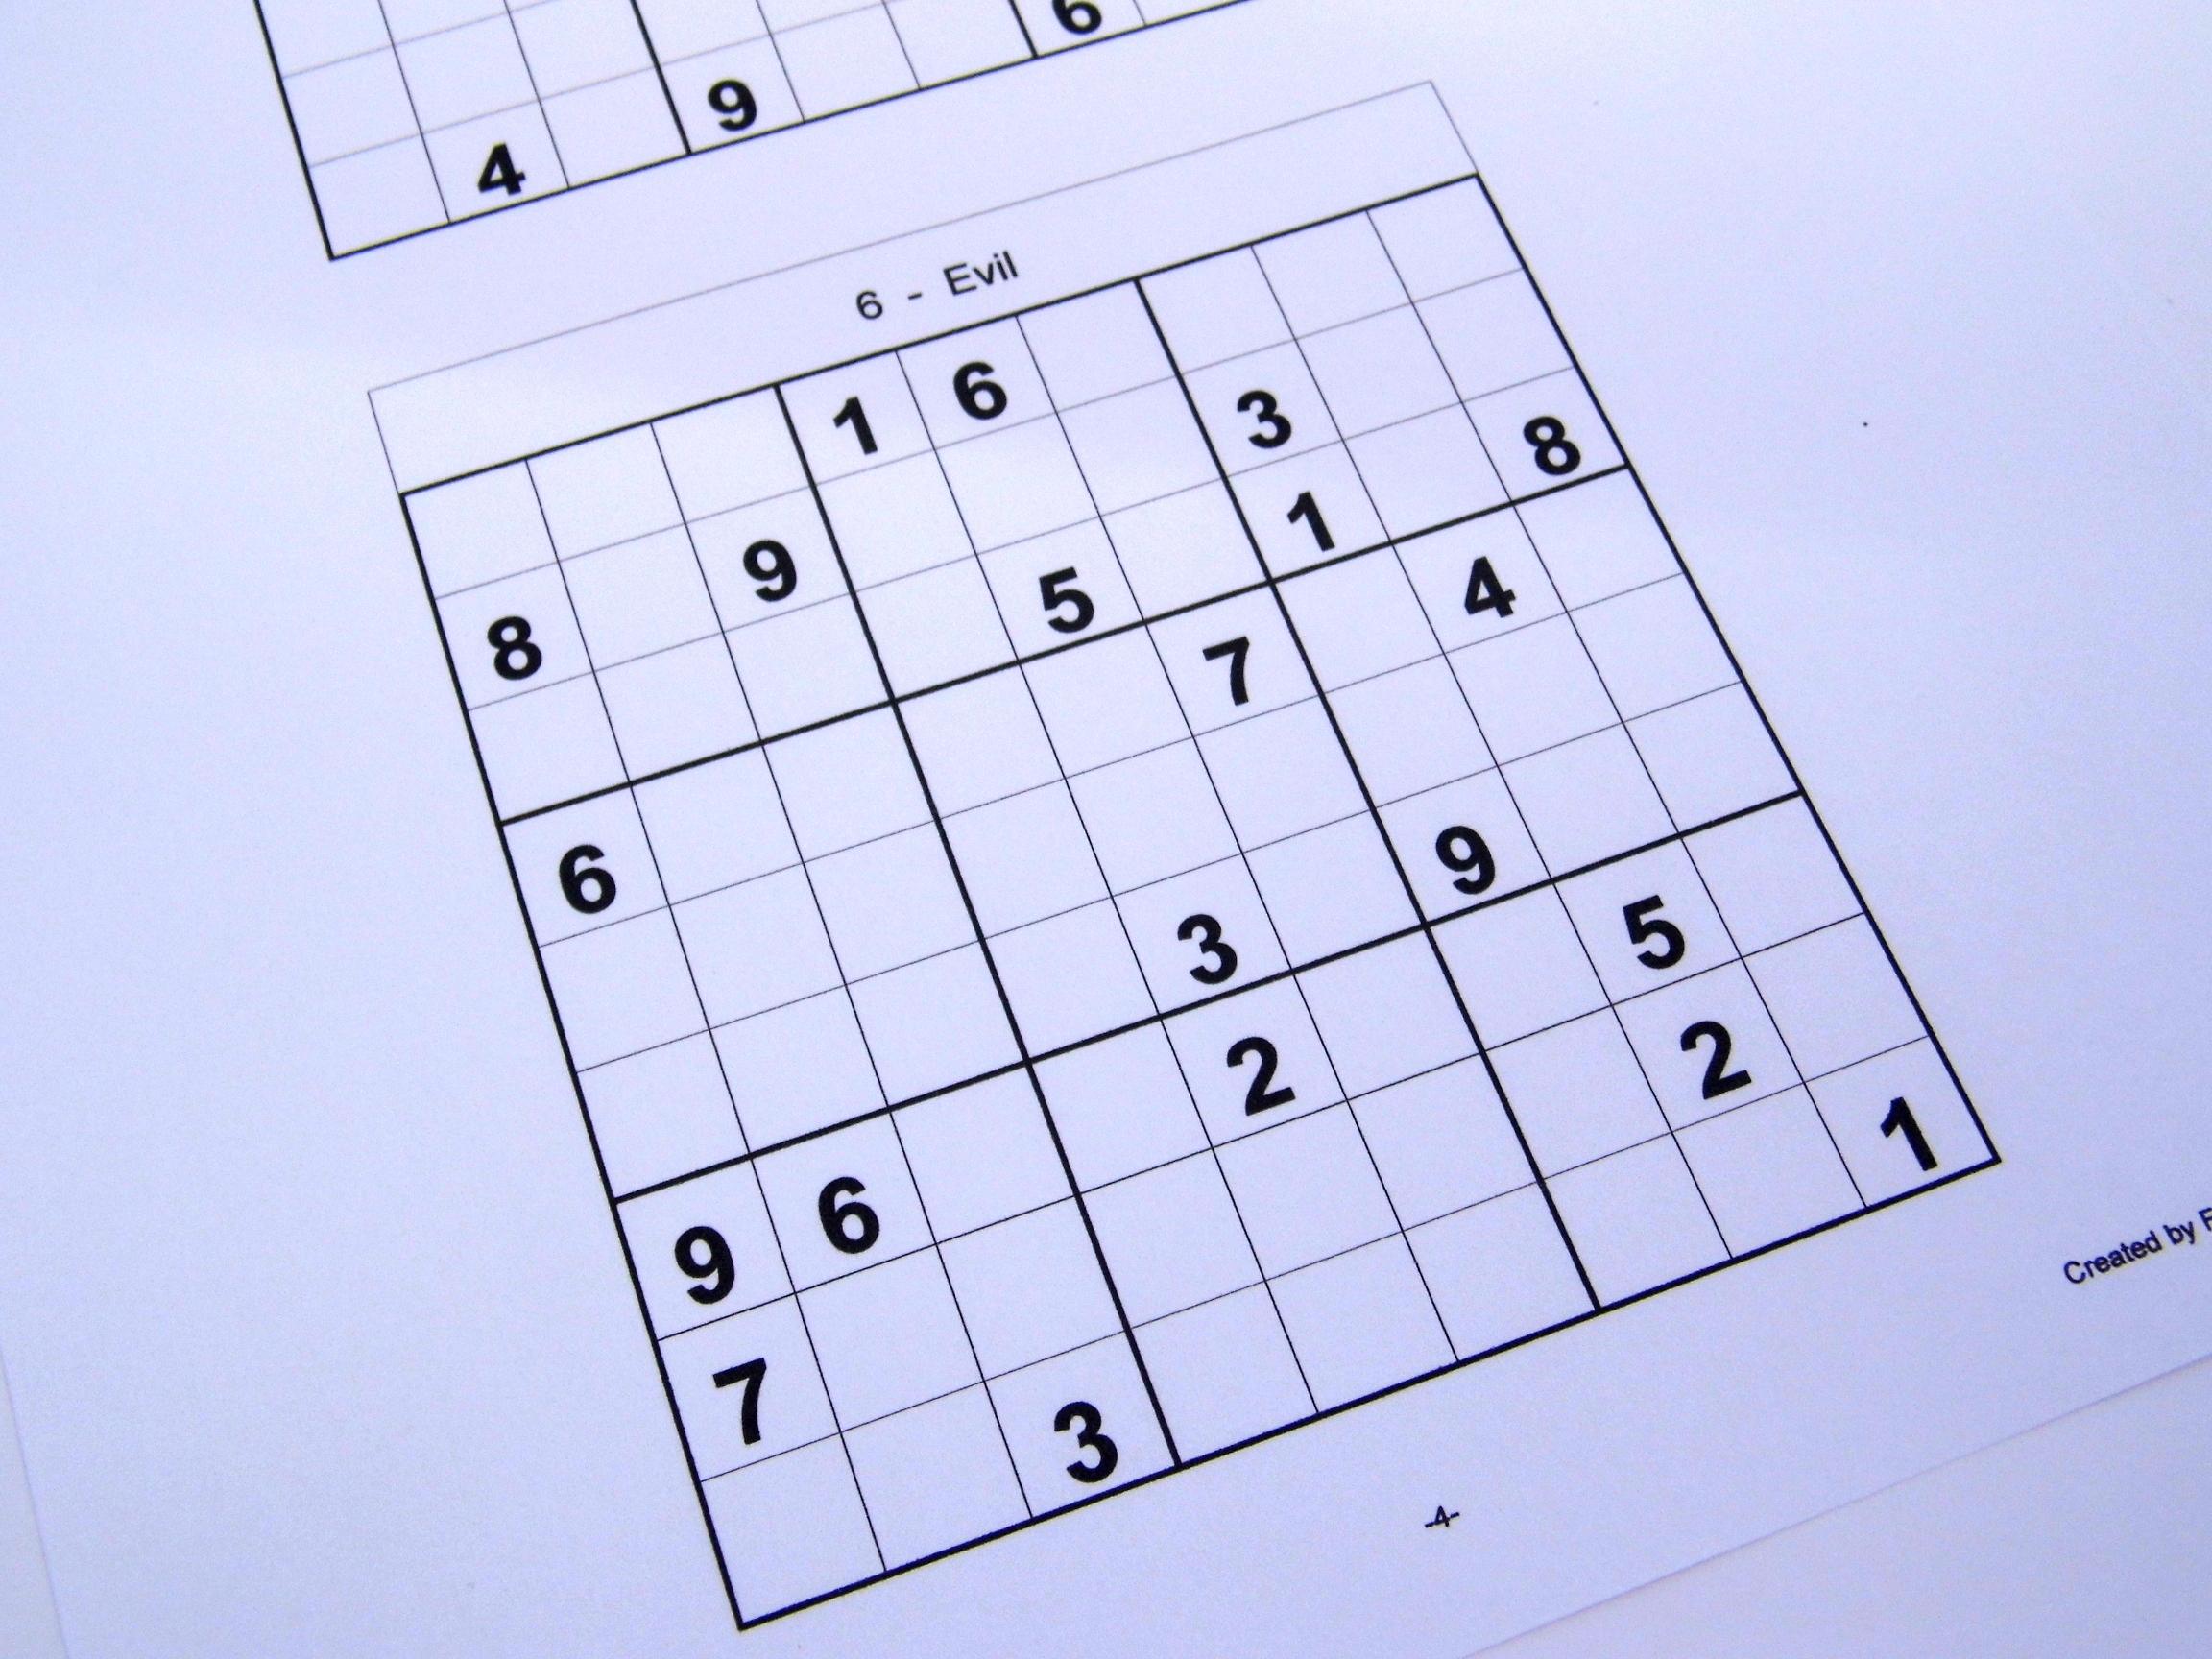 Hard Printable Sudoku Puzzles 6 Per Page – Book 1 – Free Sudoku Puzzles - Printable Sudoku Puzzles 6 Per Page